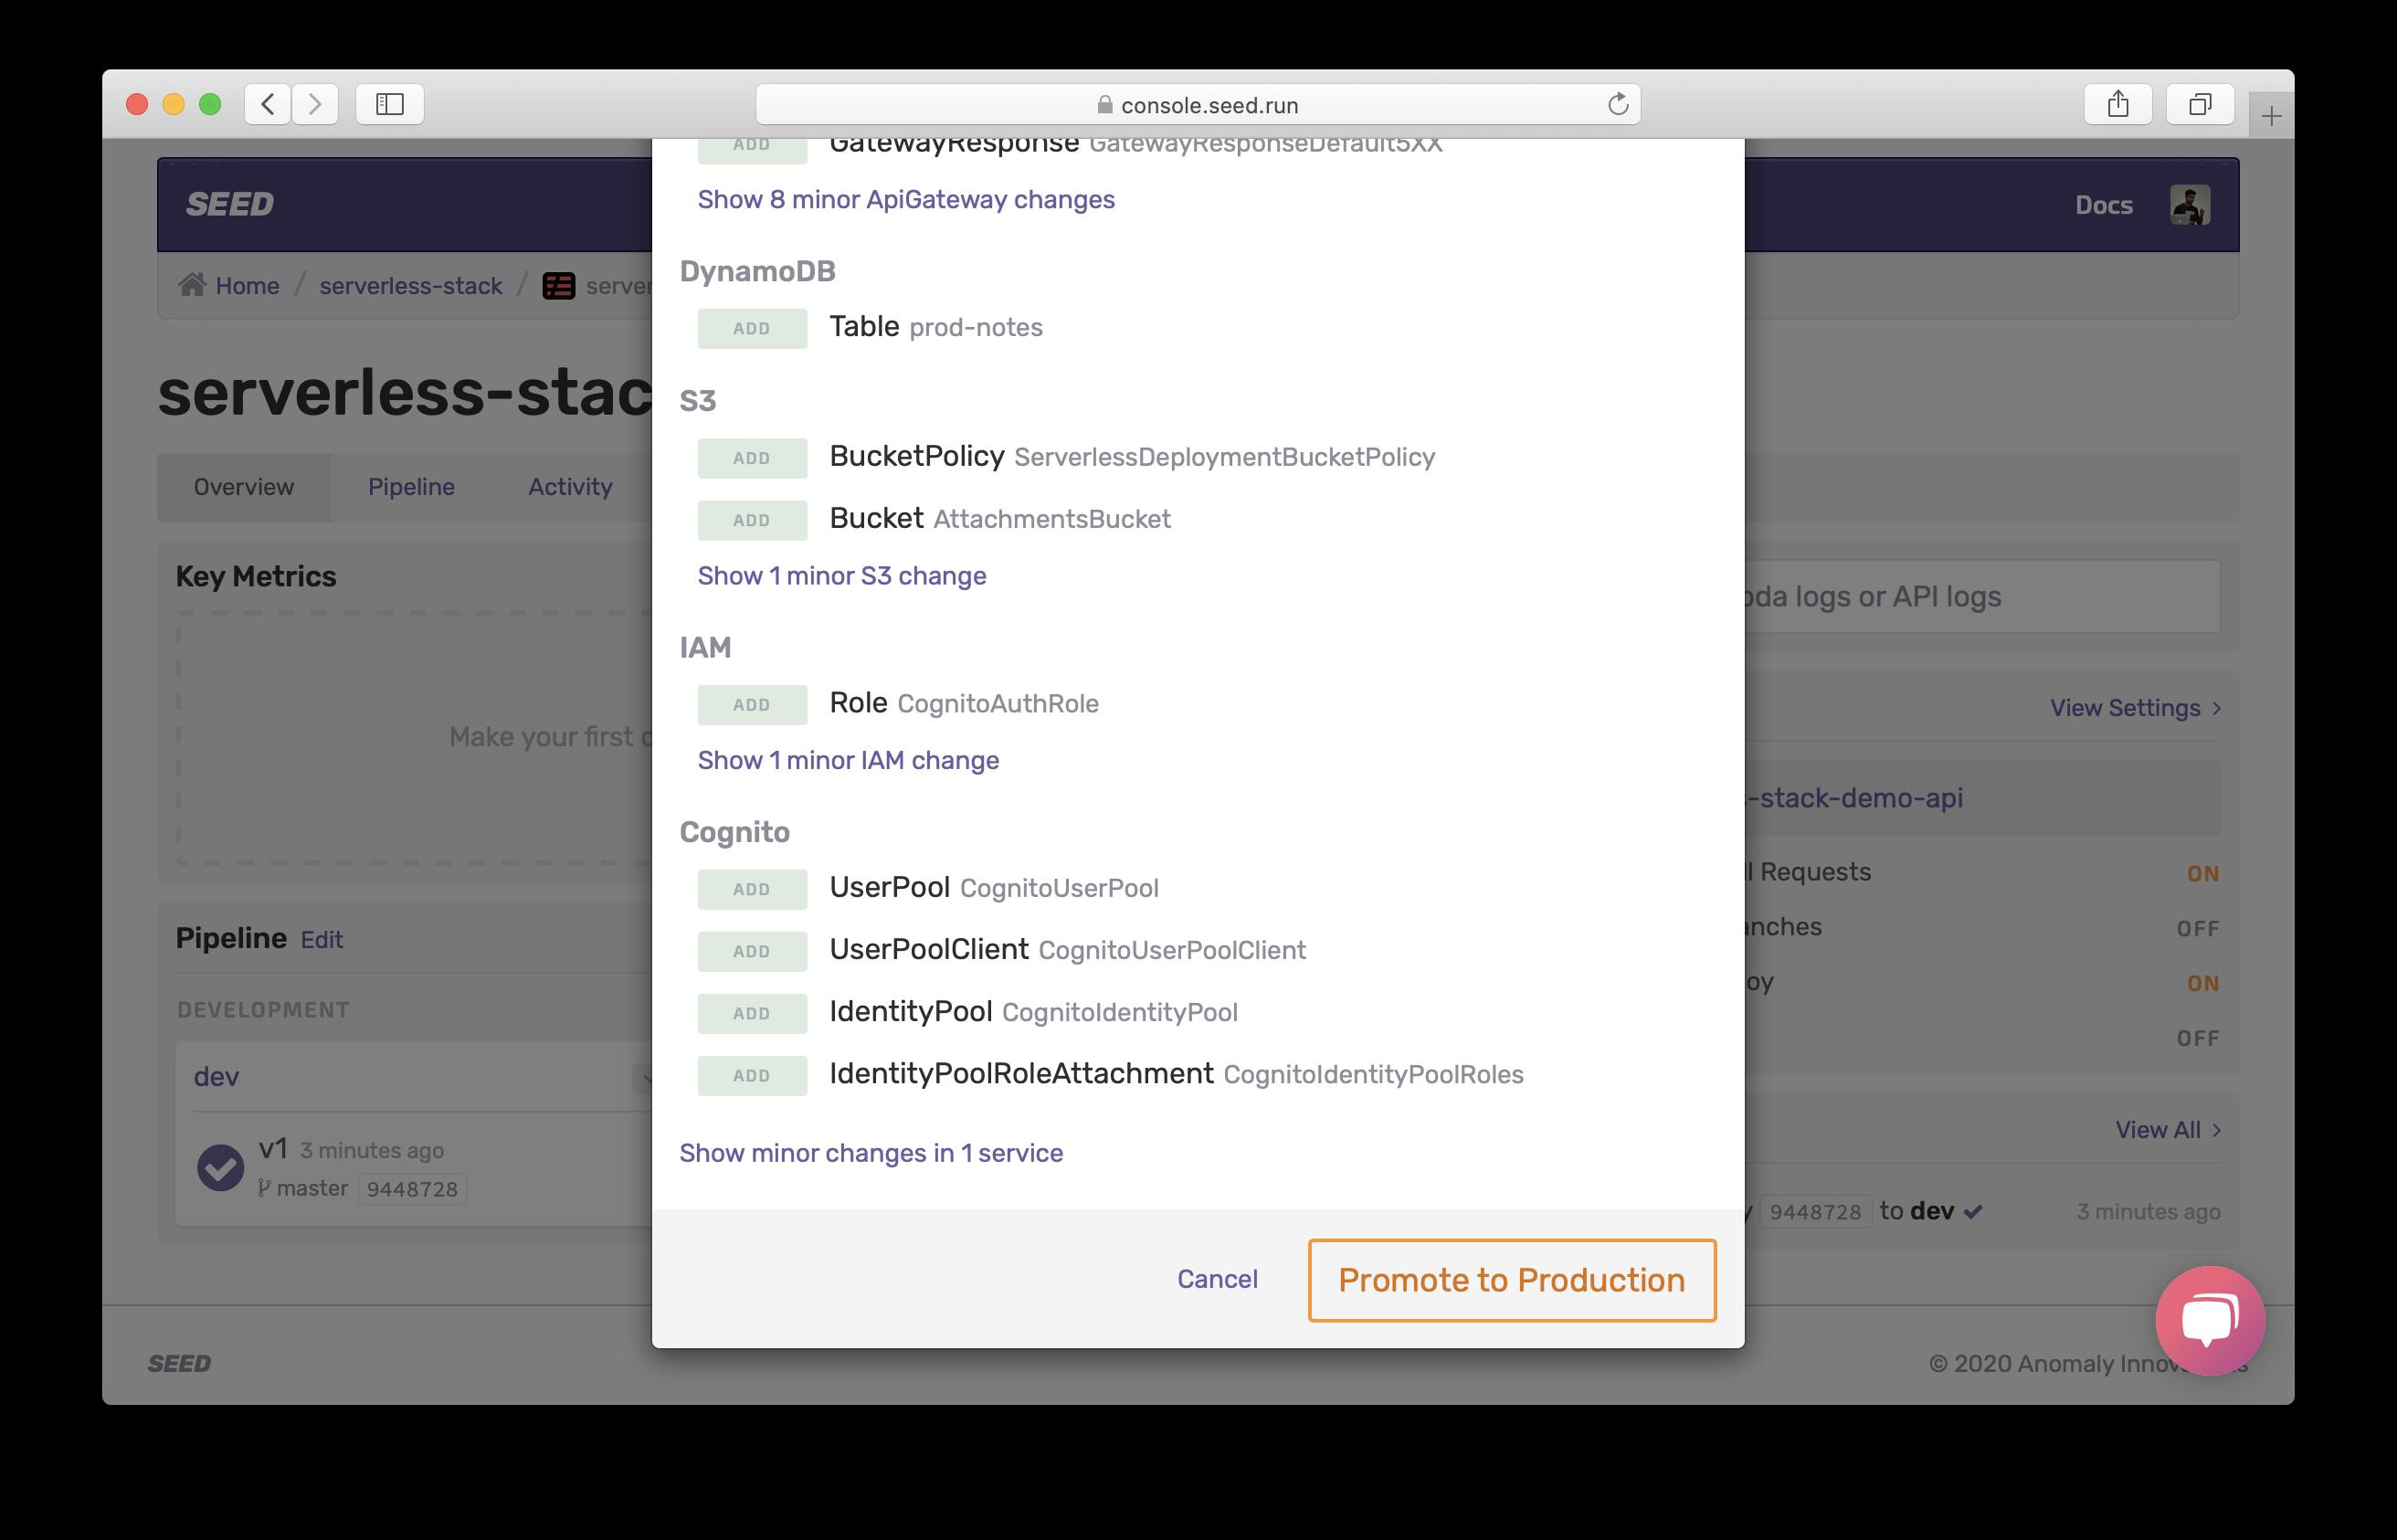 Confirm promote dev build screenshot